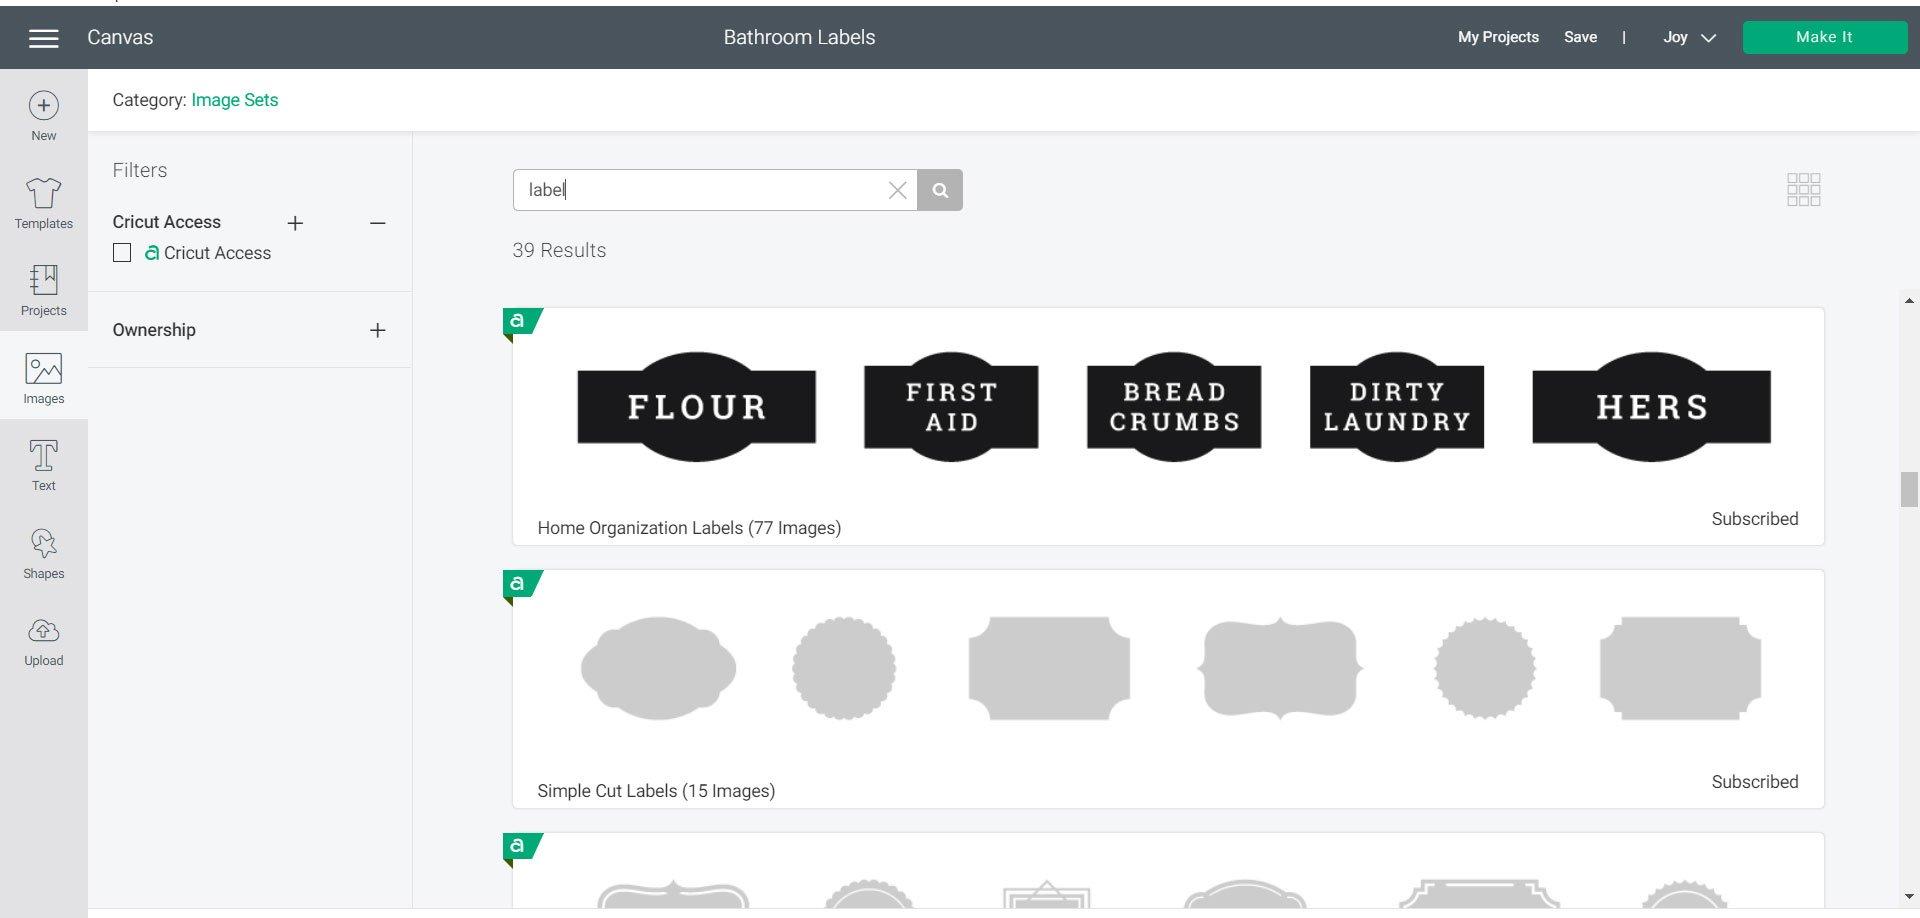 Cricut labels in image sets